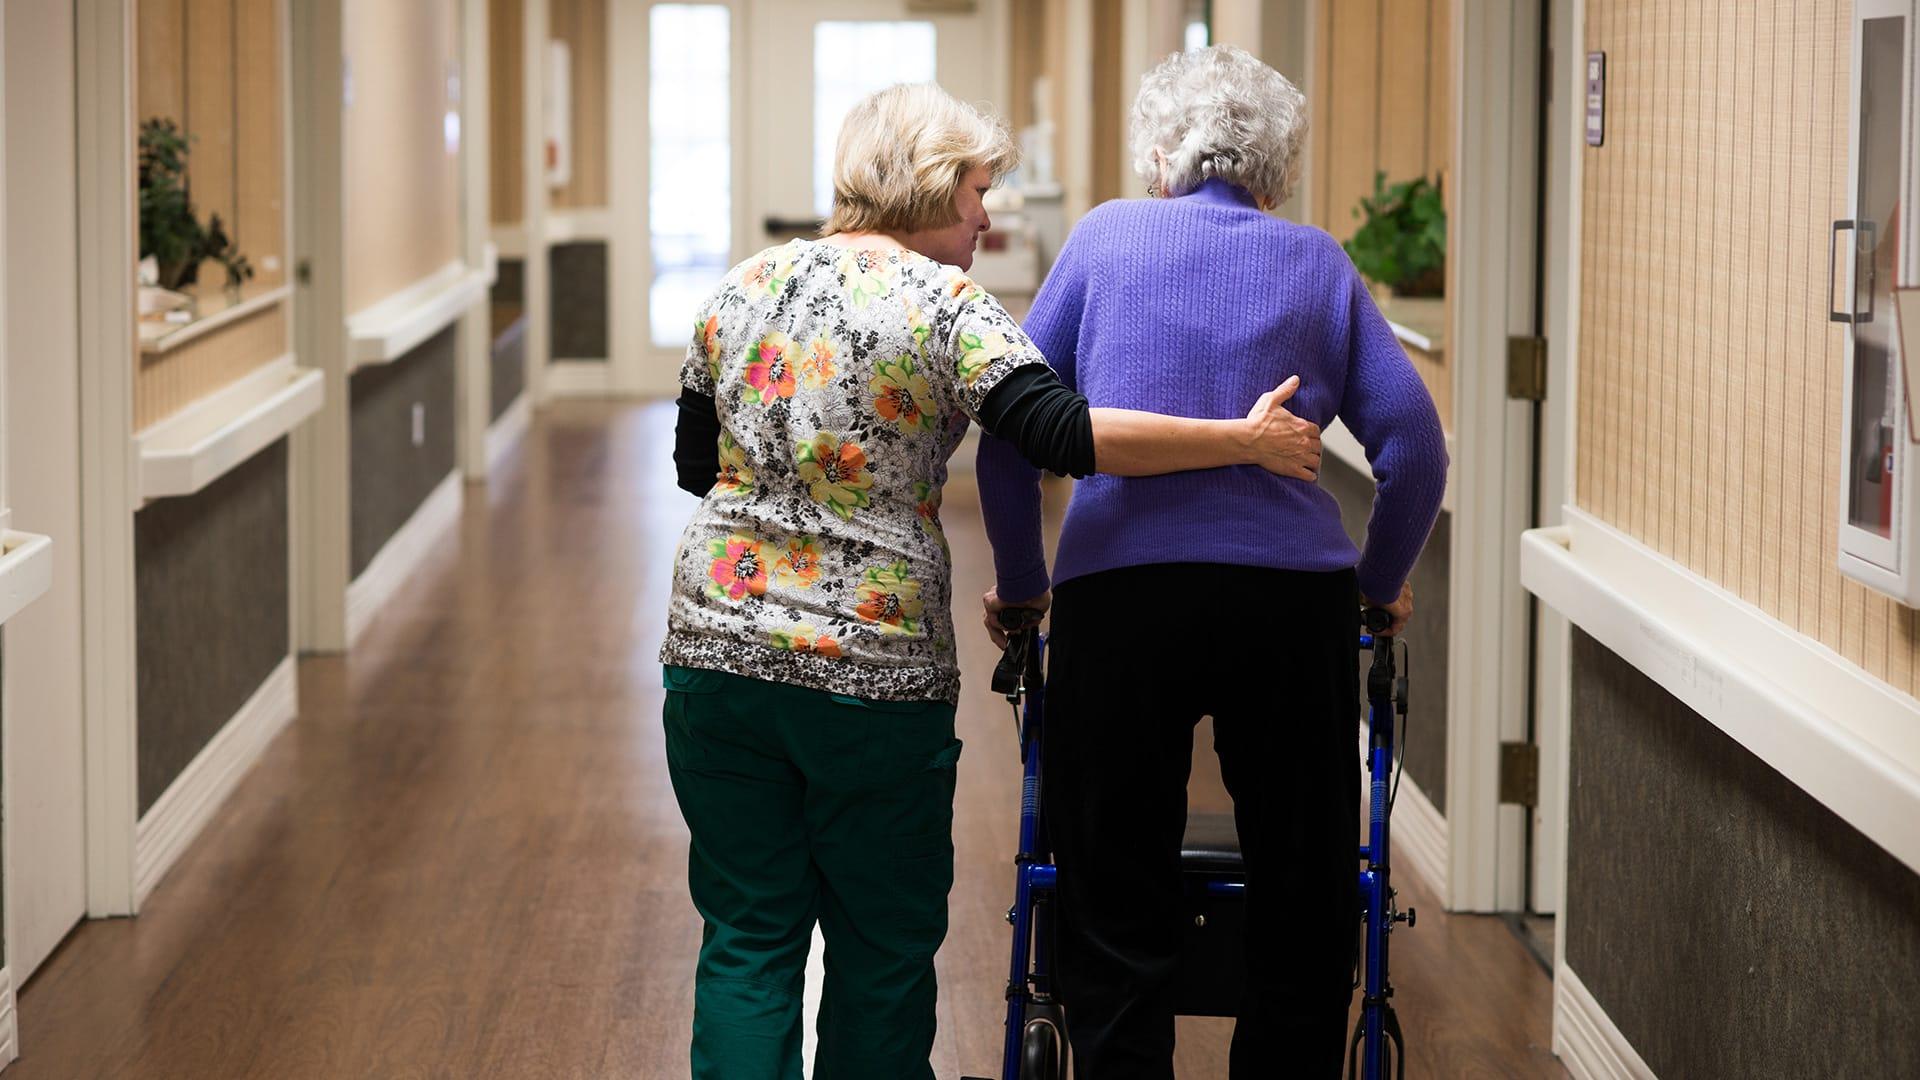 National Nurses Week: Thank You to our Nurses